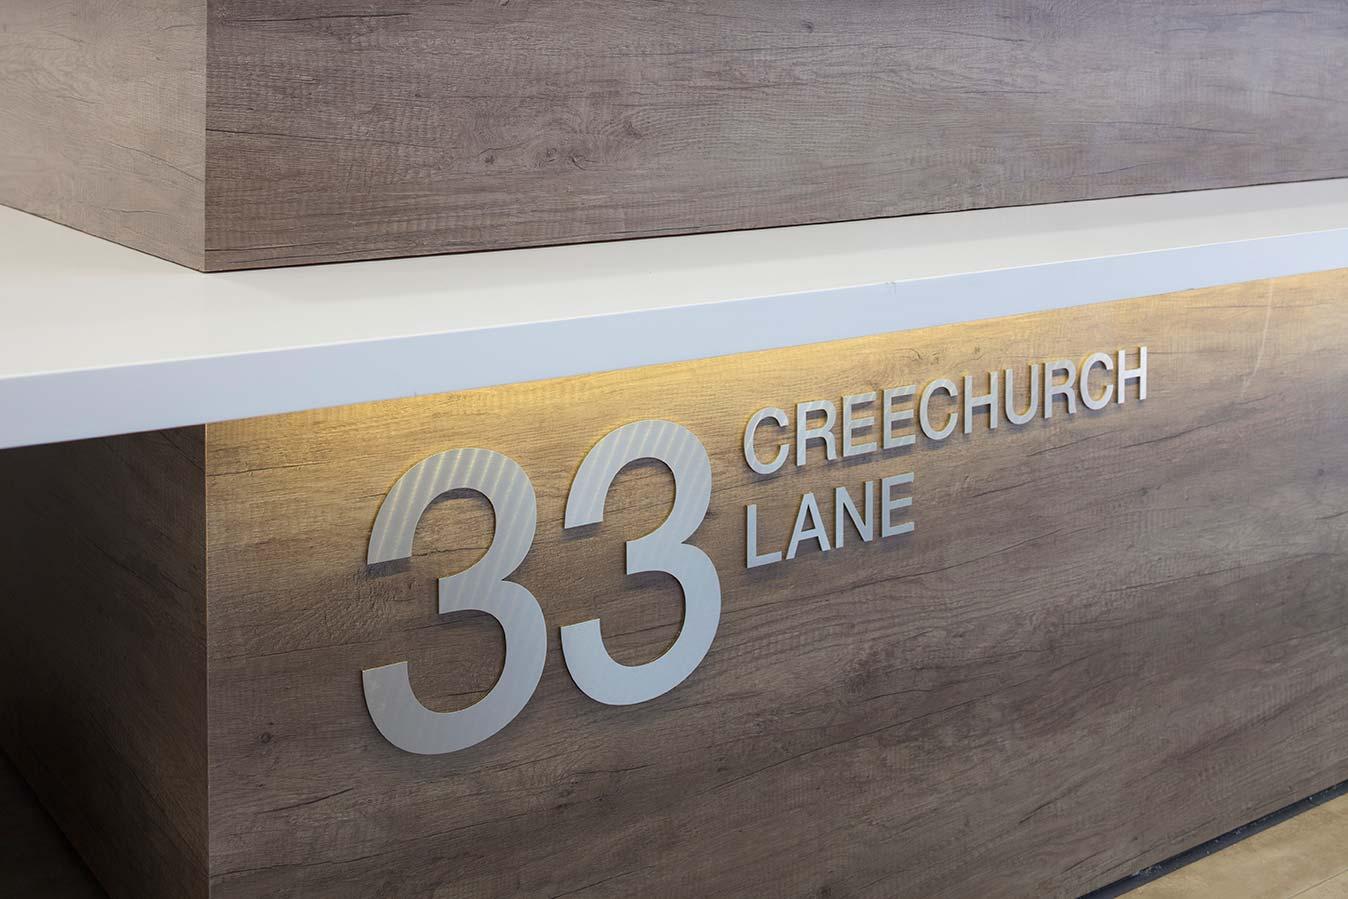 33 Creechurch Lane reception